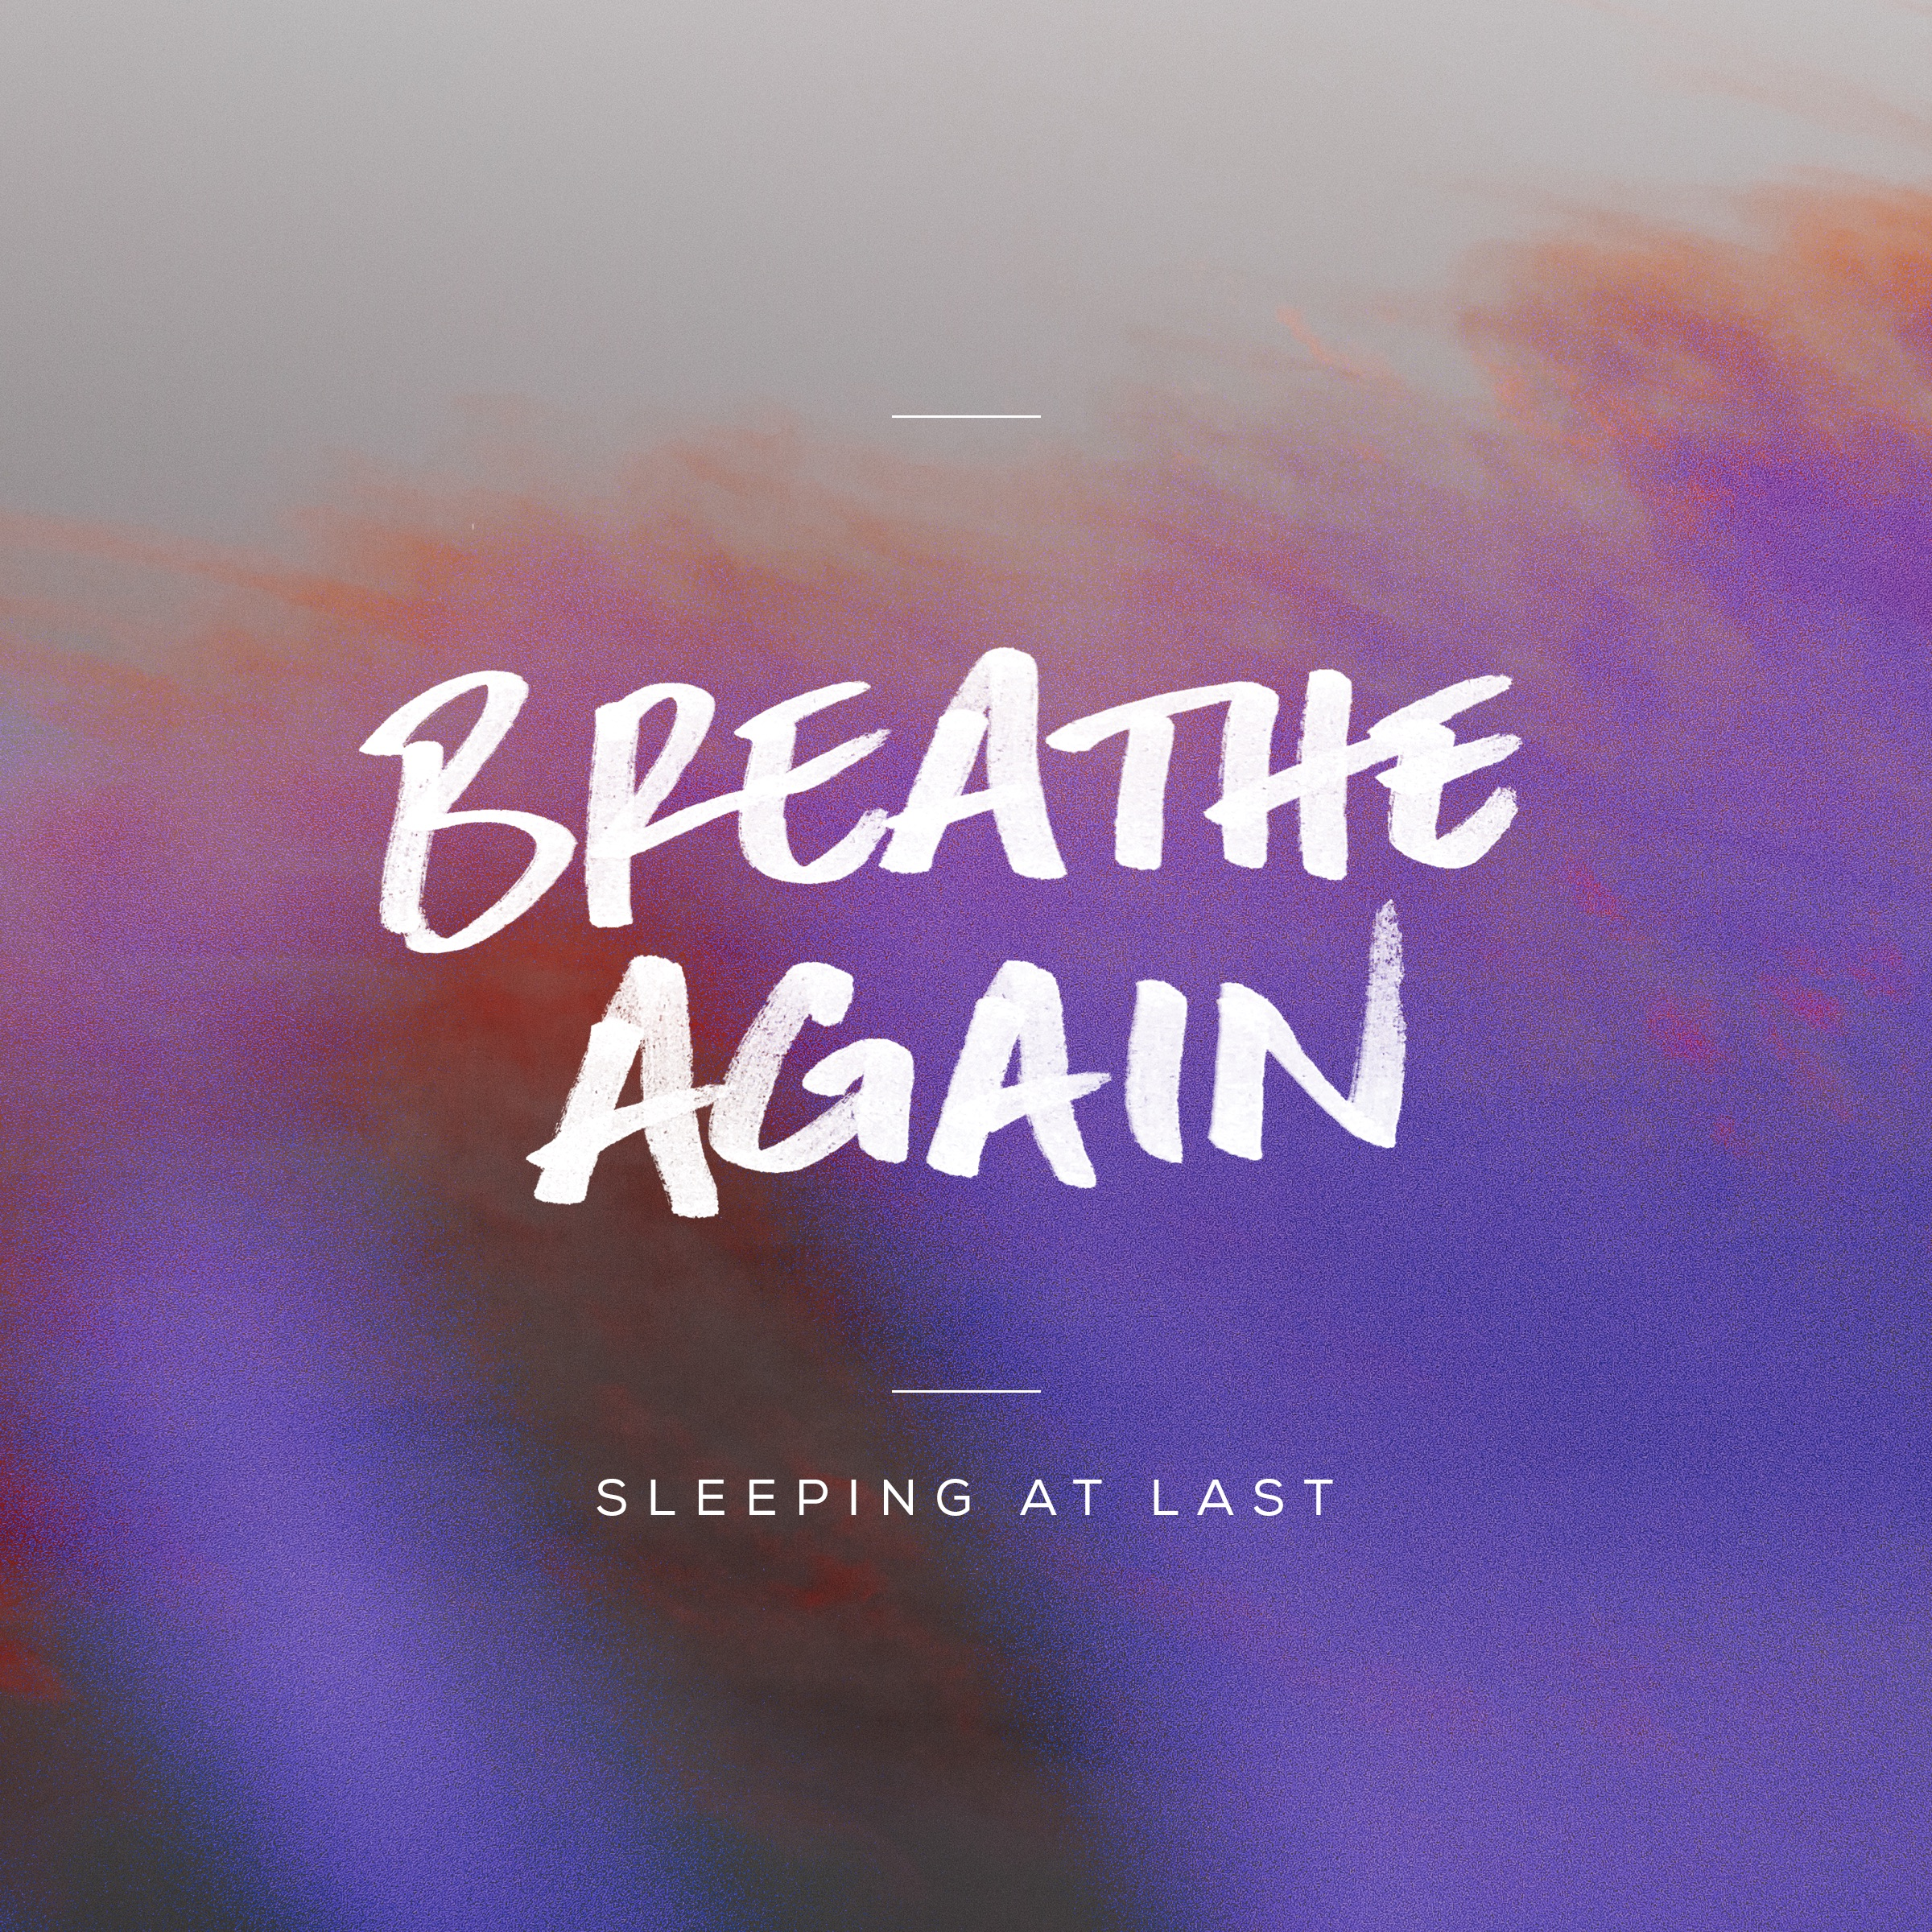 Breathe Again - Cover - 3.jpg